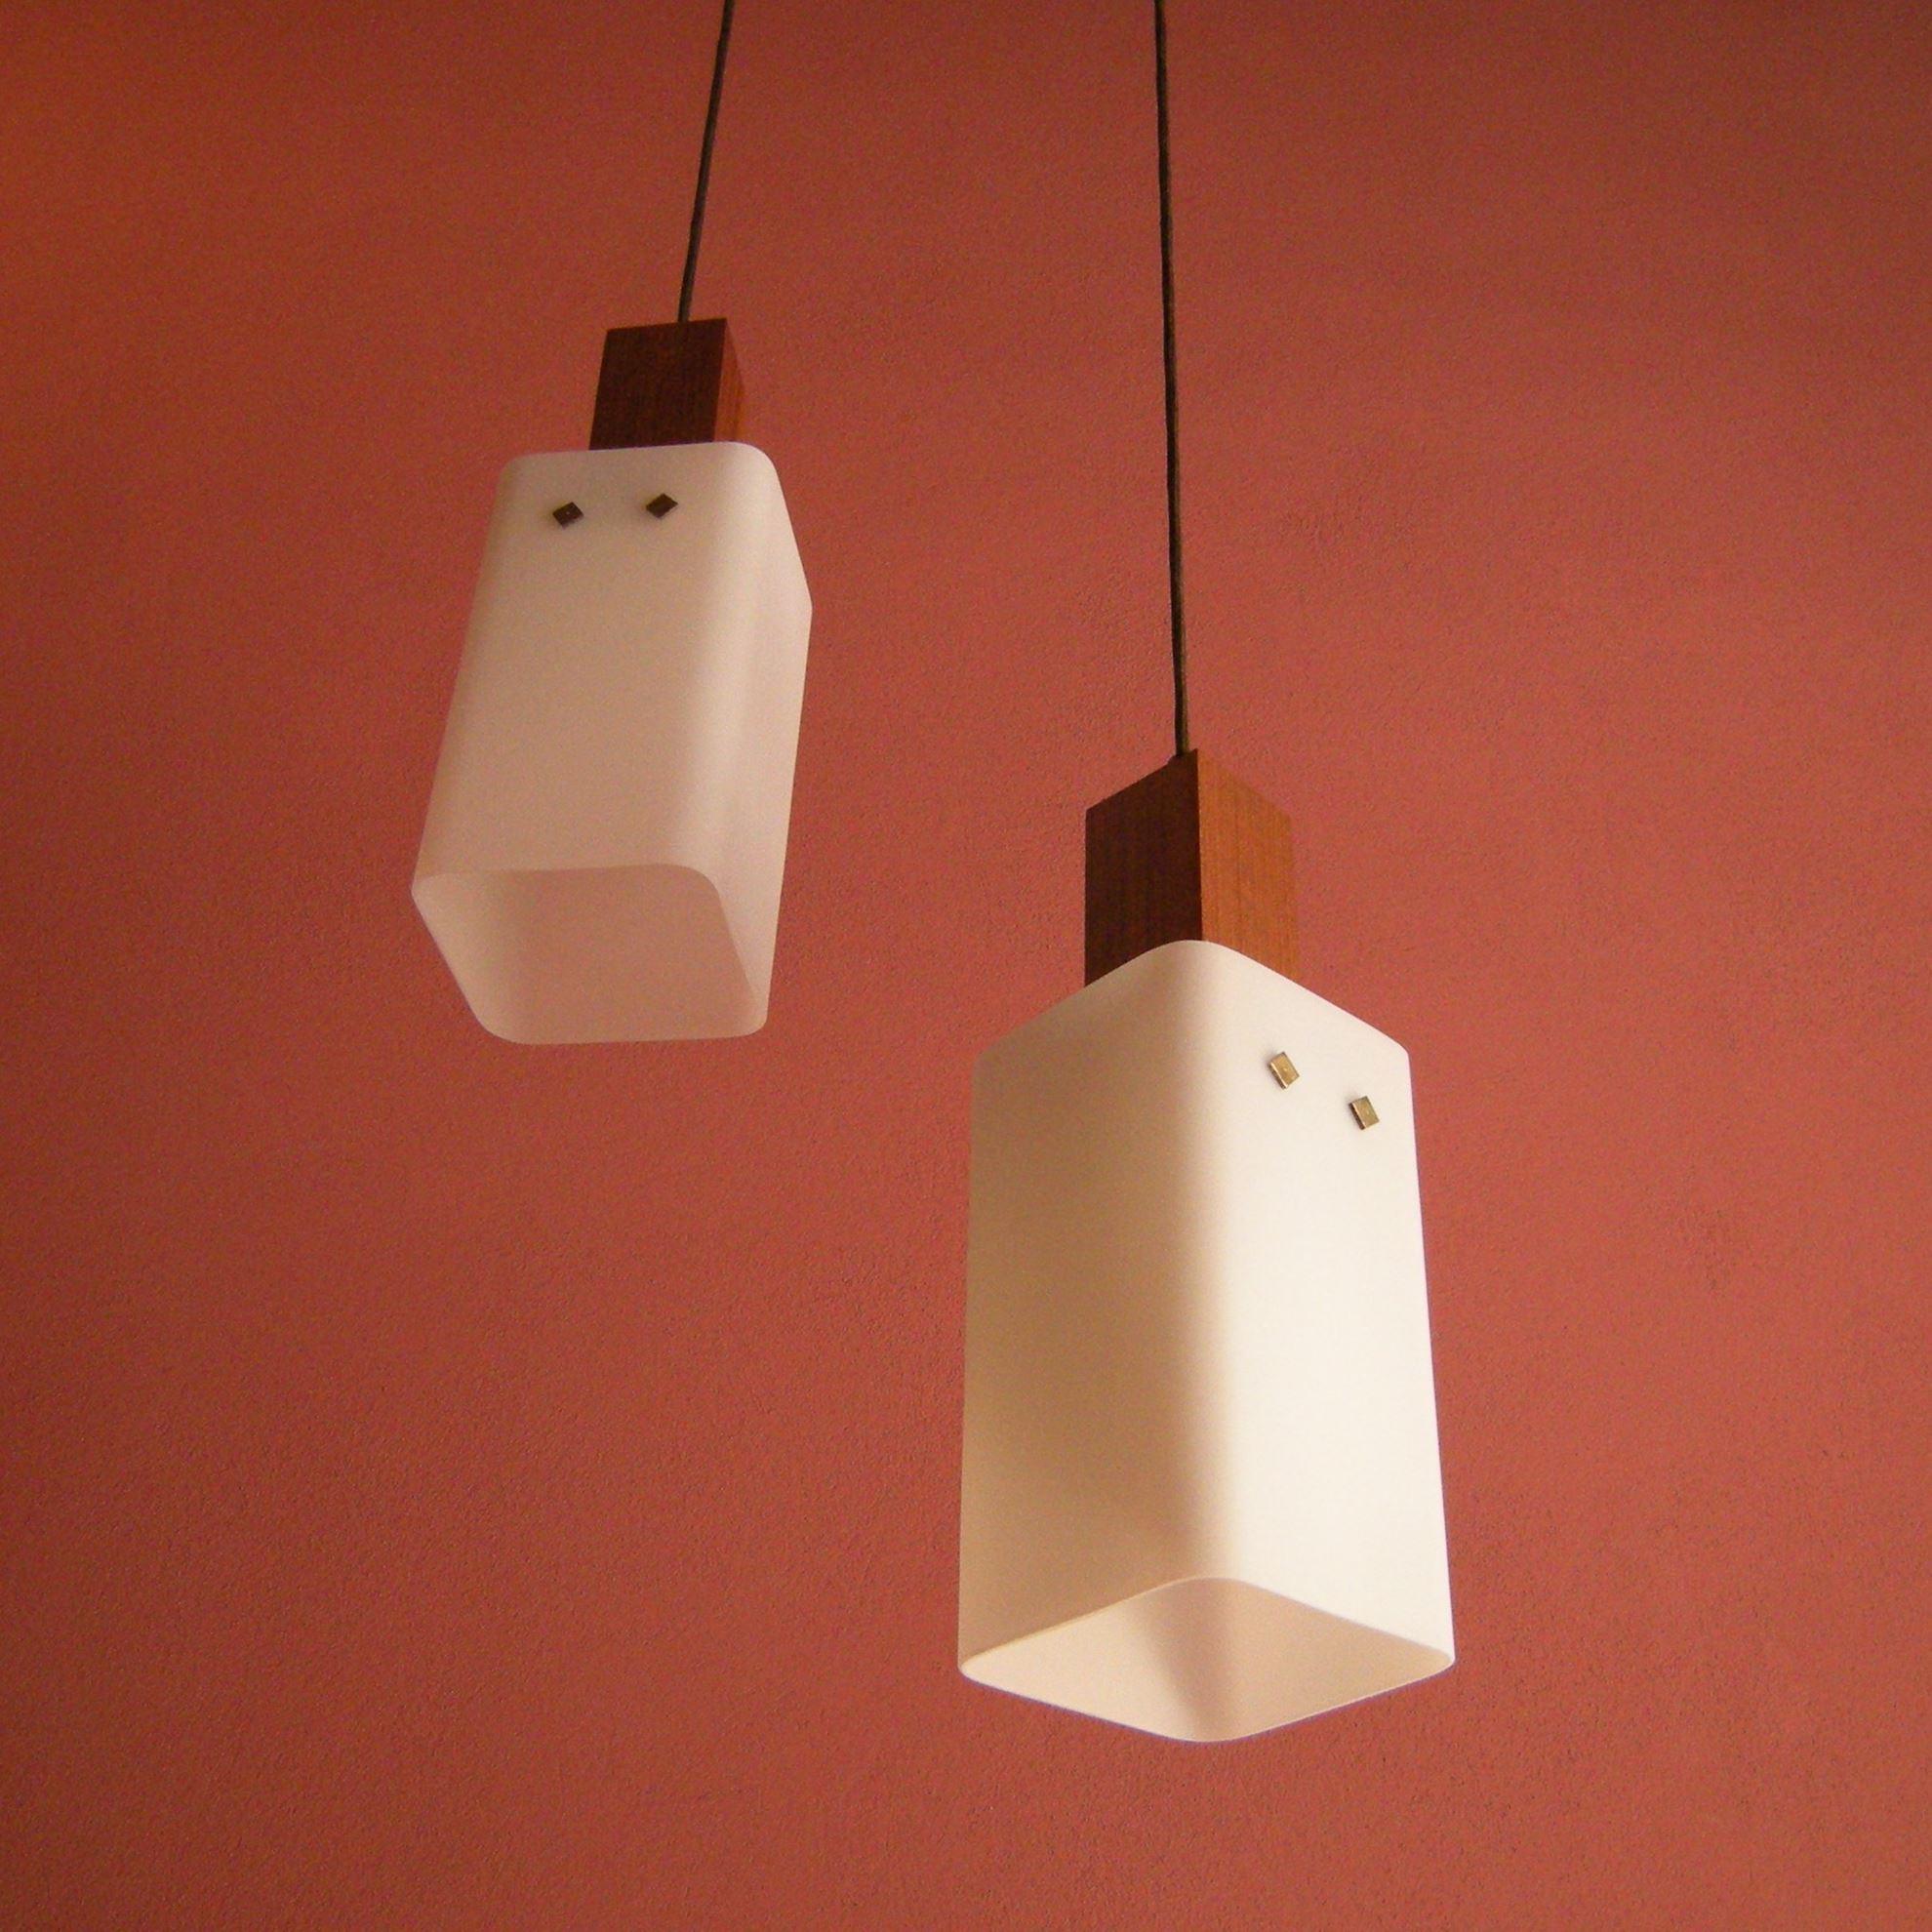 Lampada da sospensione beautiful lampade per cucina moderna lampade sospese per cucina moderna - Lampade per cucina moderna ...